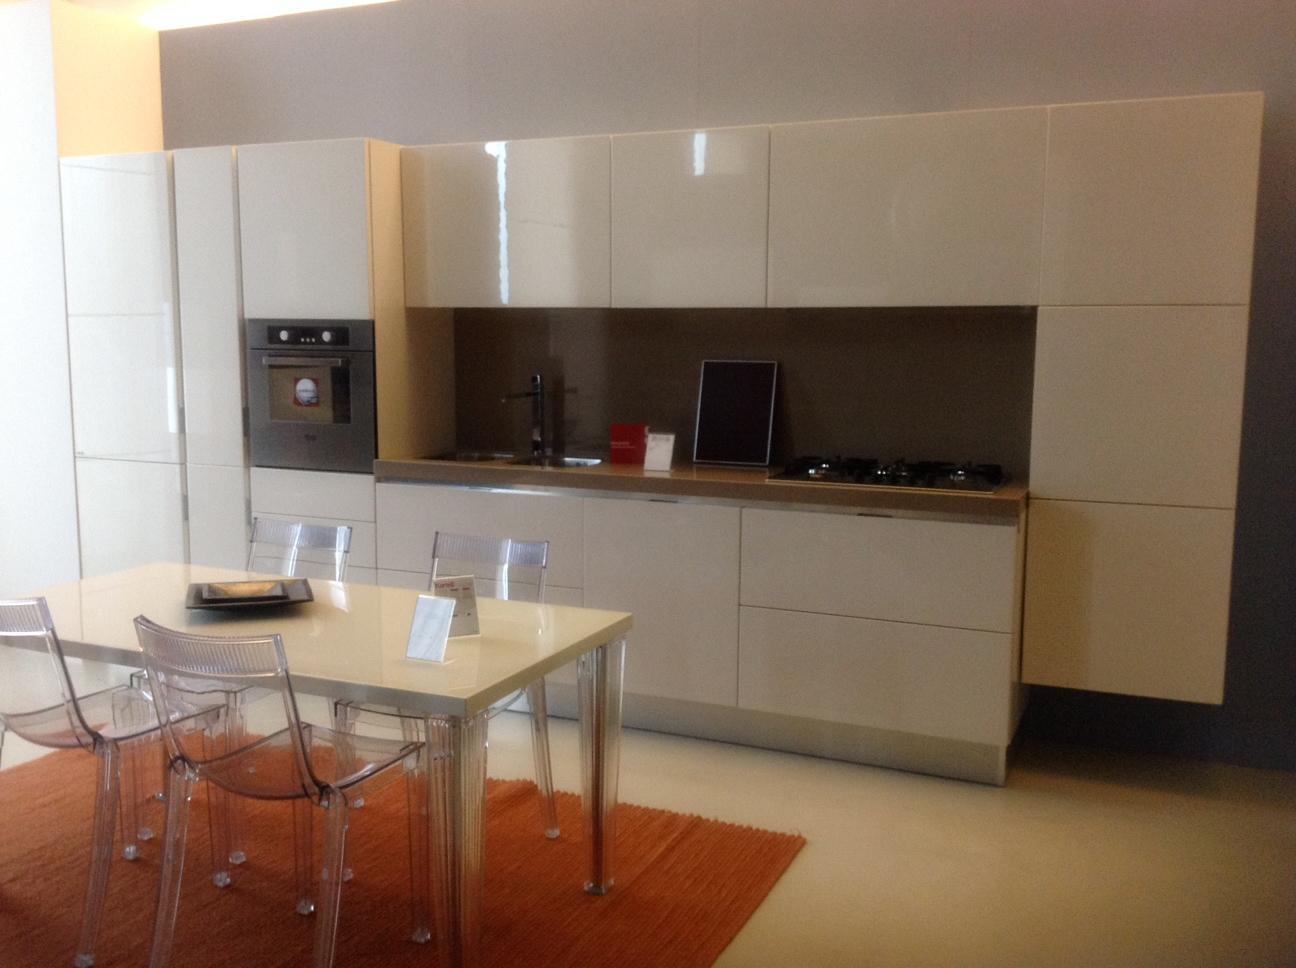 Offerta scavolini scenery cucine a prezzi scontati - Scavolini cucine moderne ...